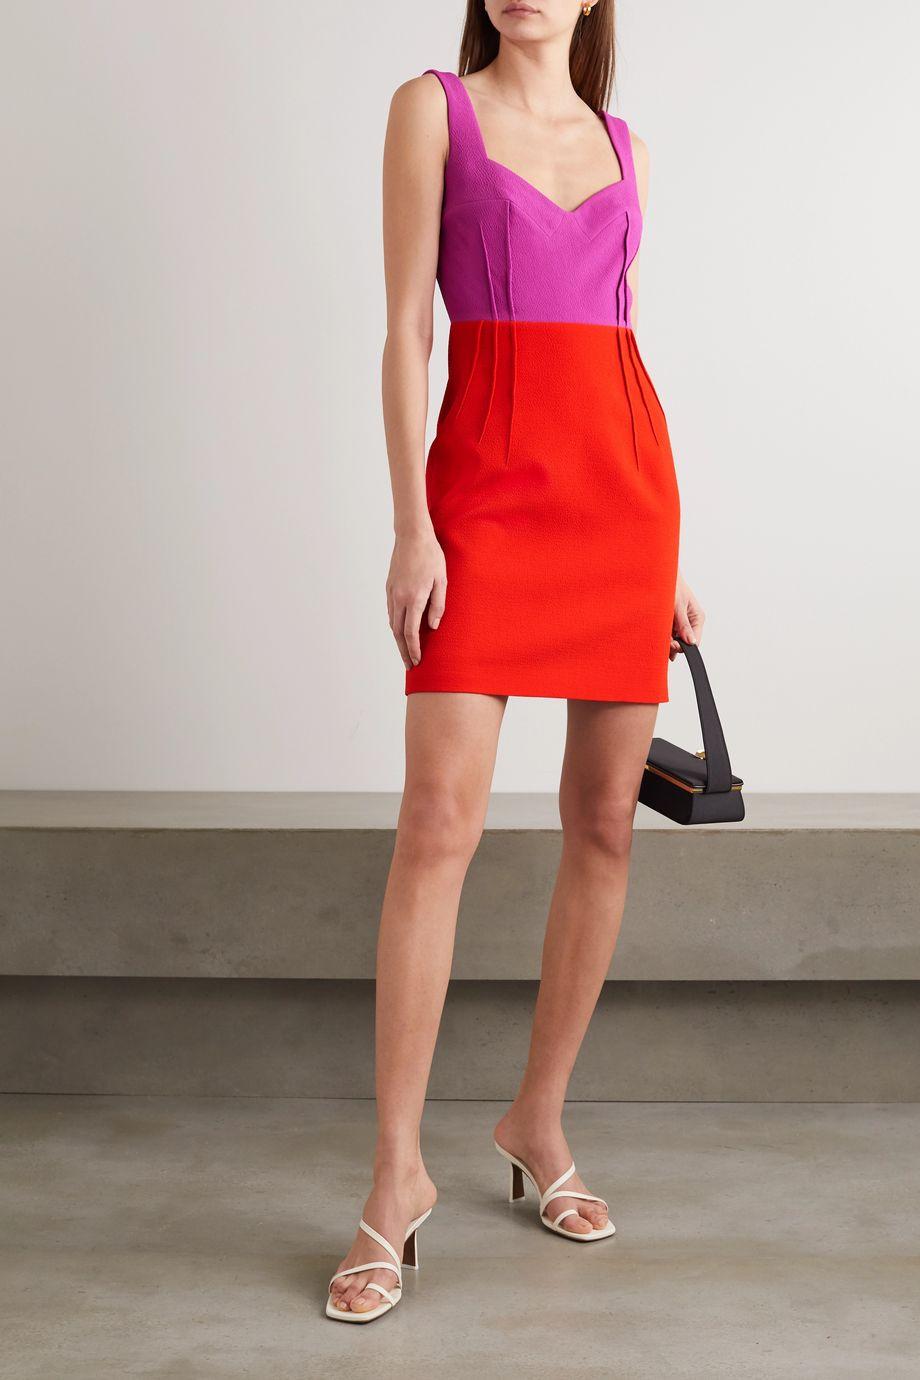 Emilia Wickstead Jude two-tone crepe mini dress